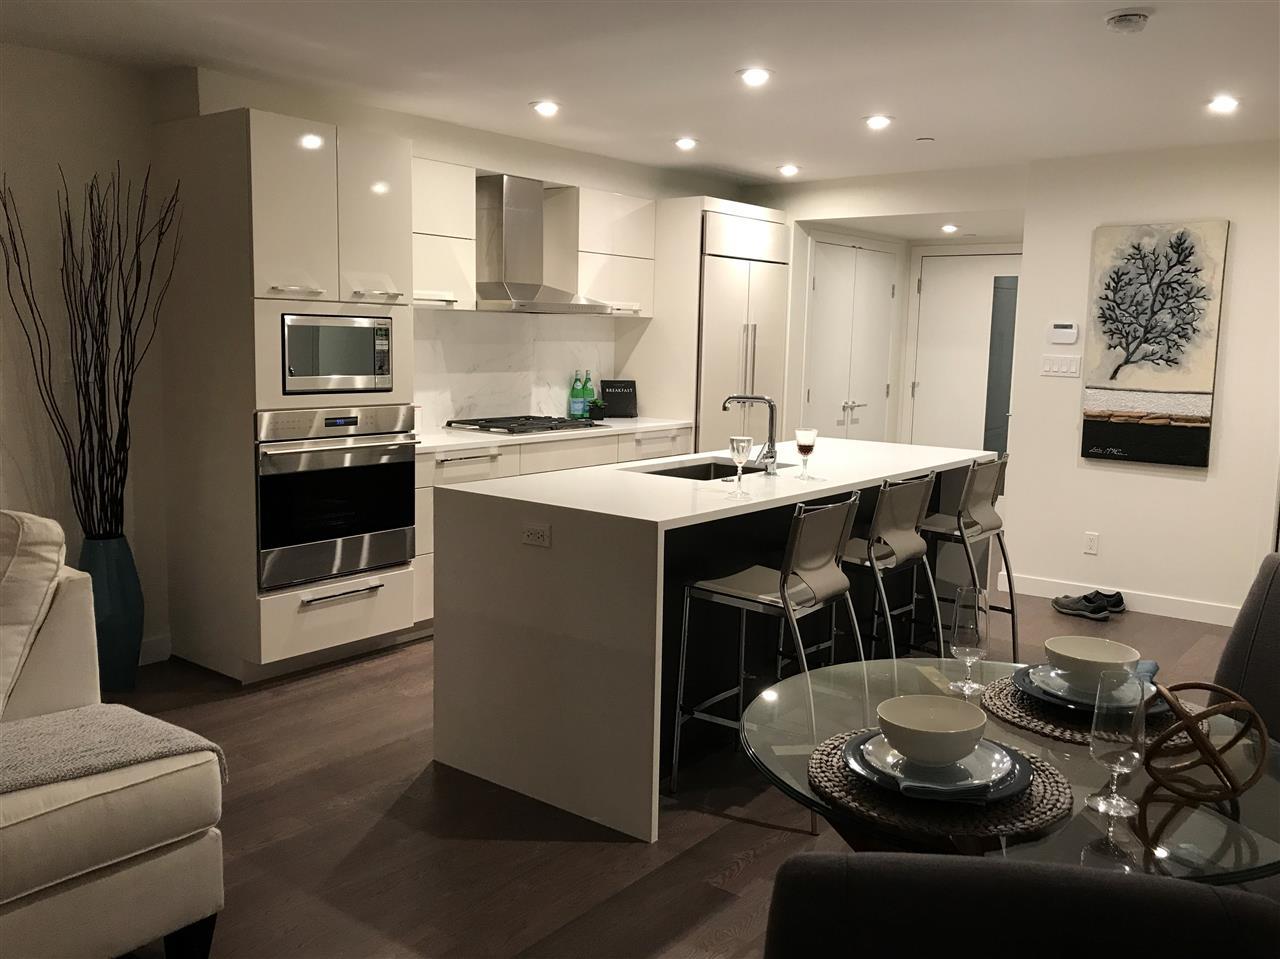 Condo Apartment at 203 1150 OXFORD STREET, Unit 203, South Surrey White Rock, British Columbia. Image 10